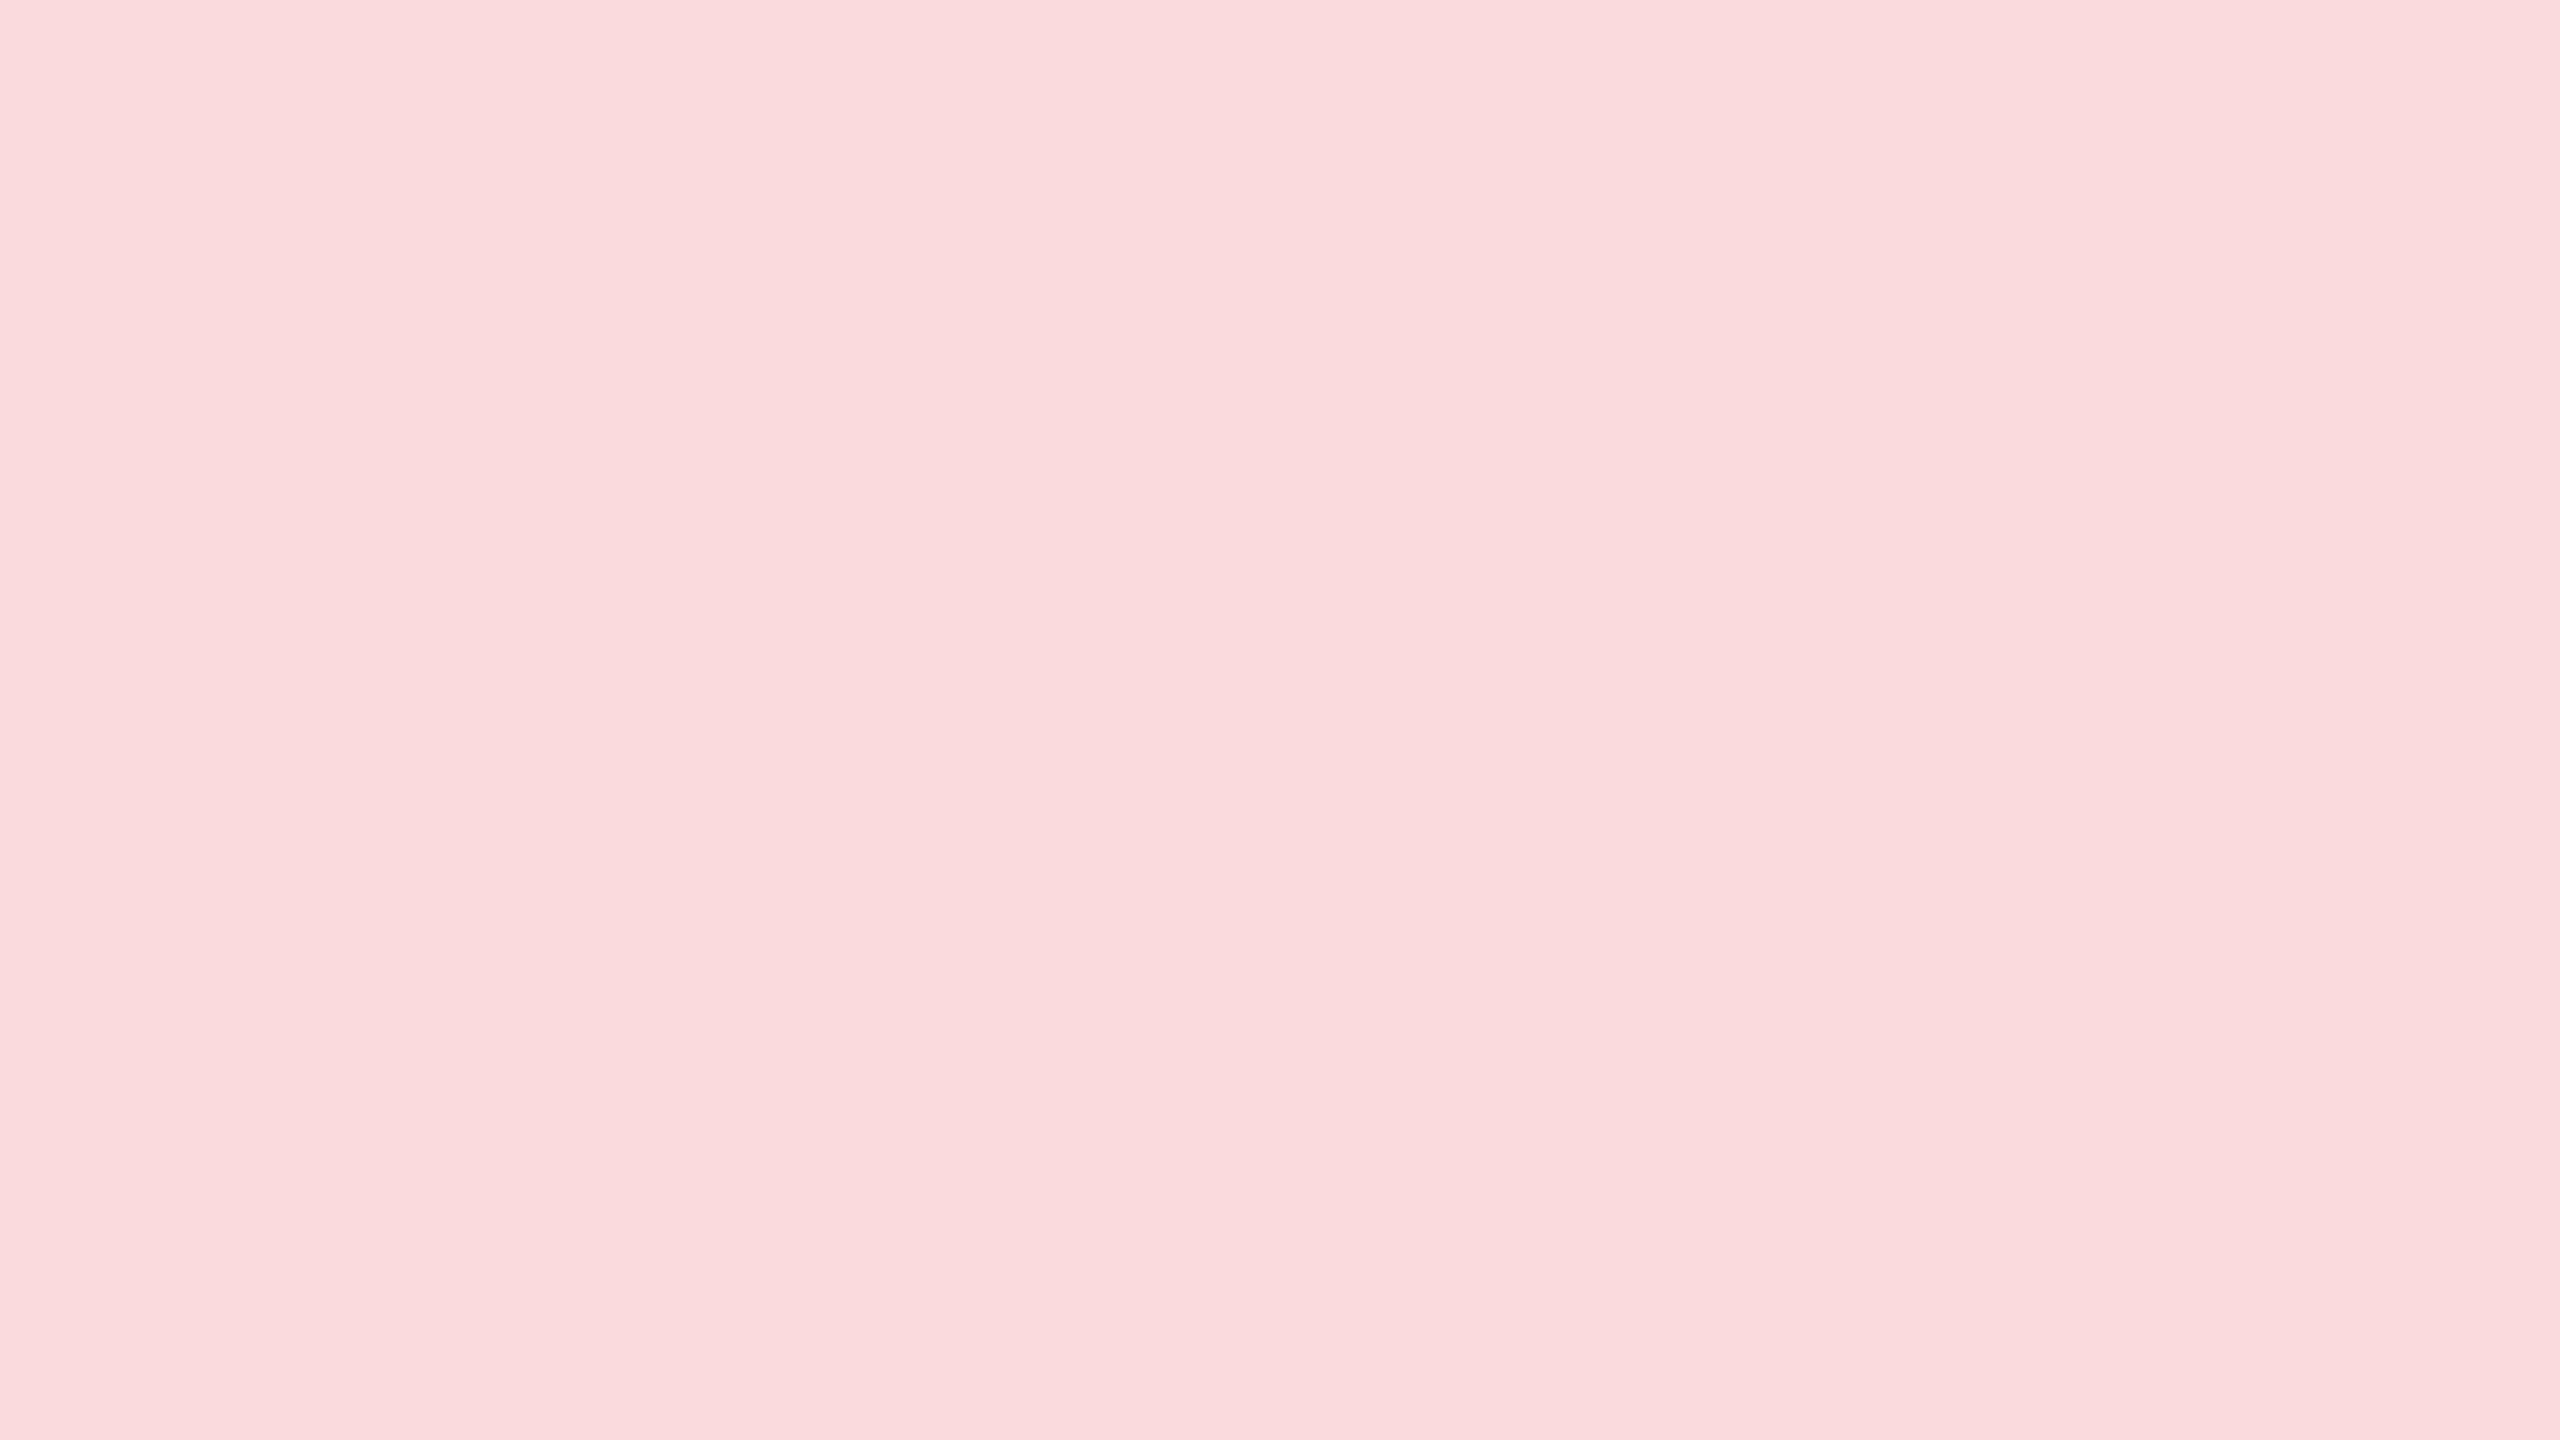 Aesthetic Pink Desktop Wallpapers Top Free Aesthetic Pink Desktop Backgrounds Wallpaperaccess